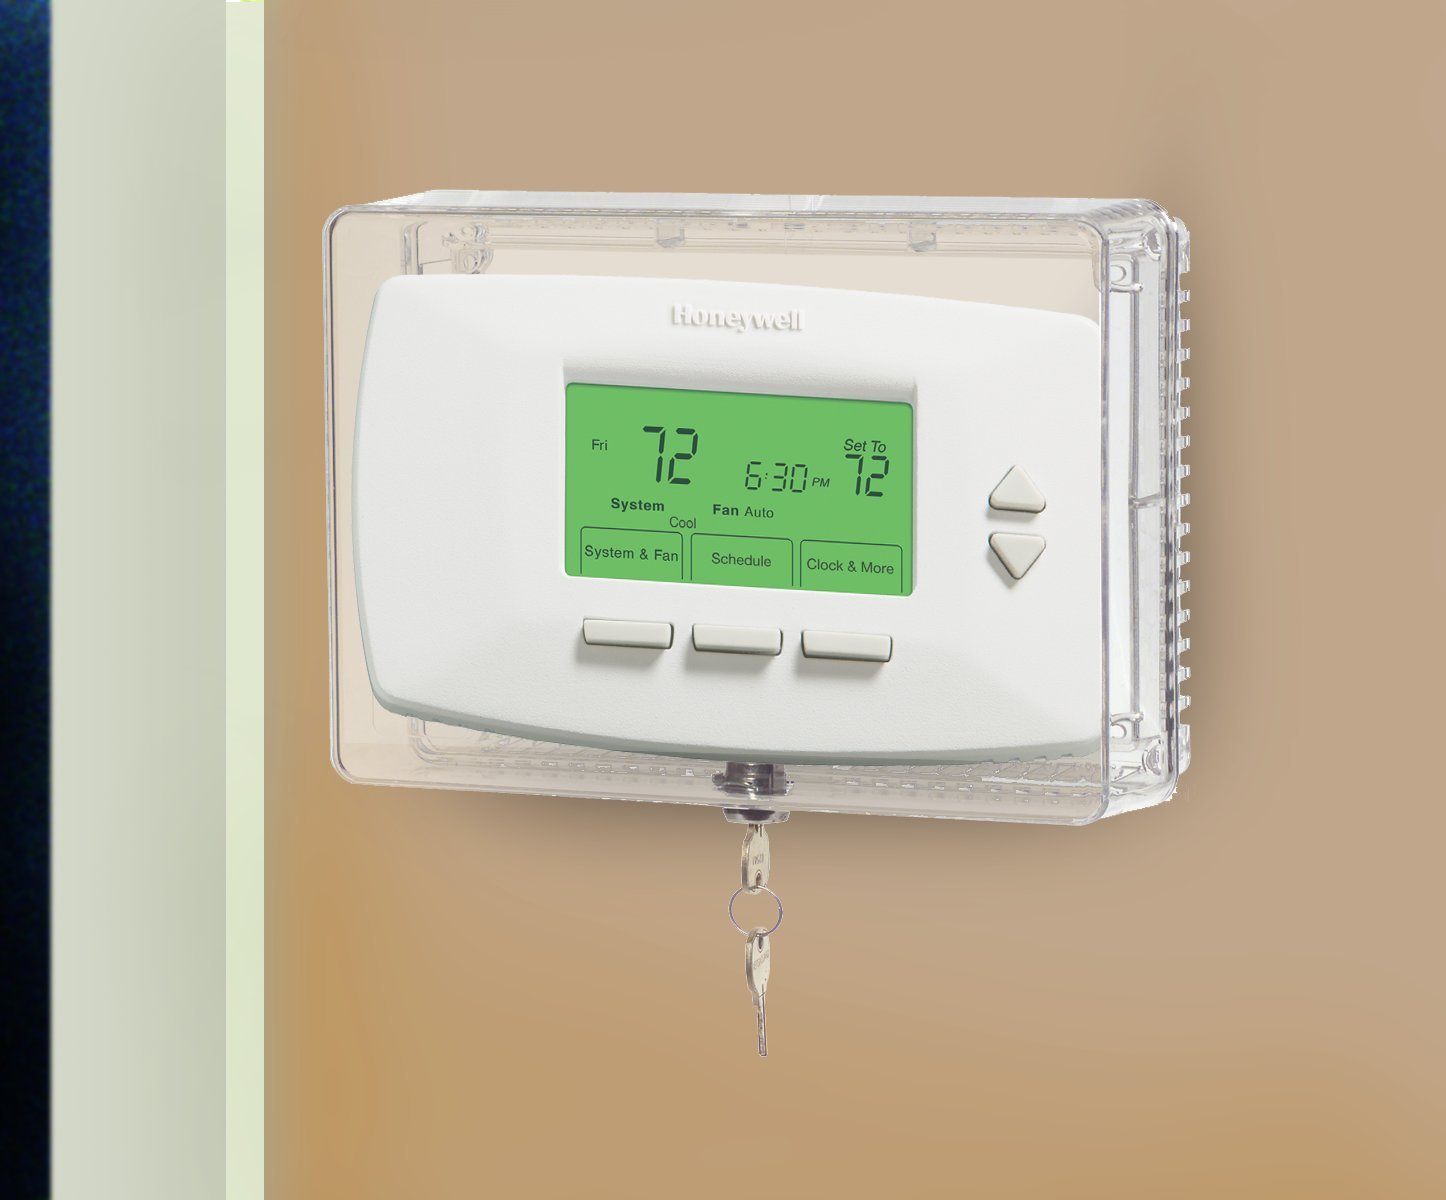 clr thermostat cover amazon co uk diy \u0026 toolsInstall Thermostat Lock Box #13